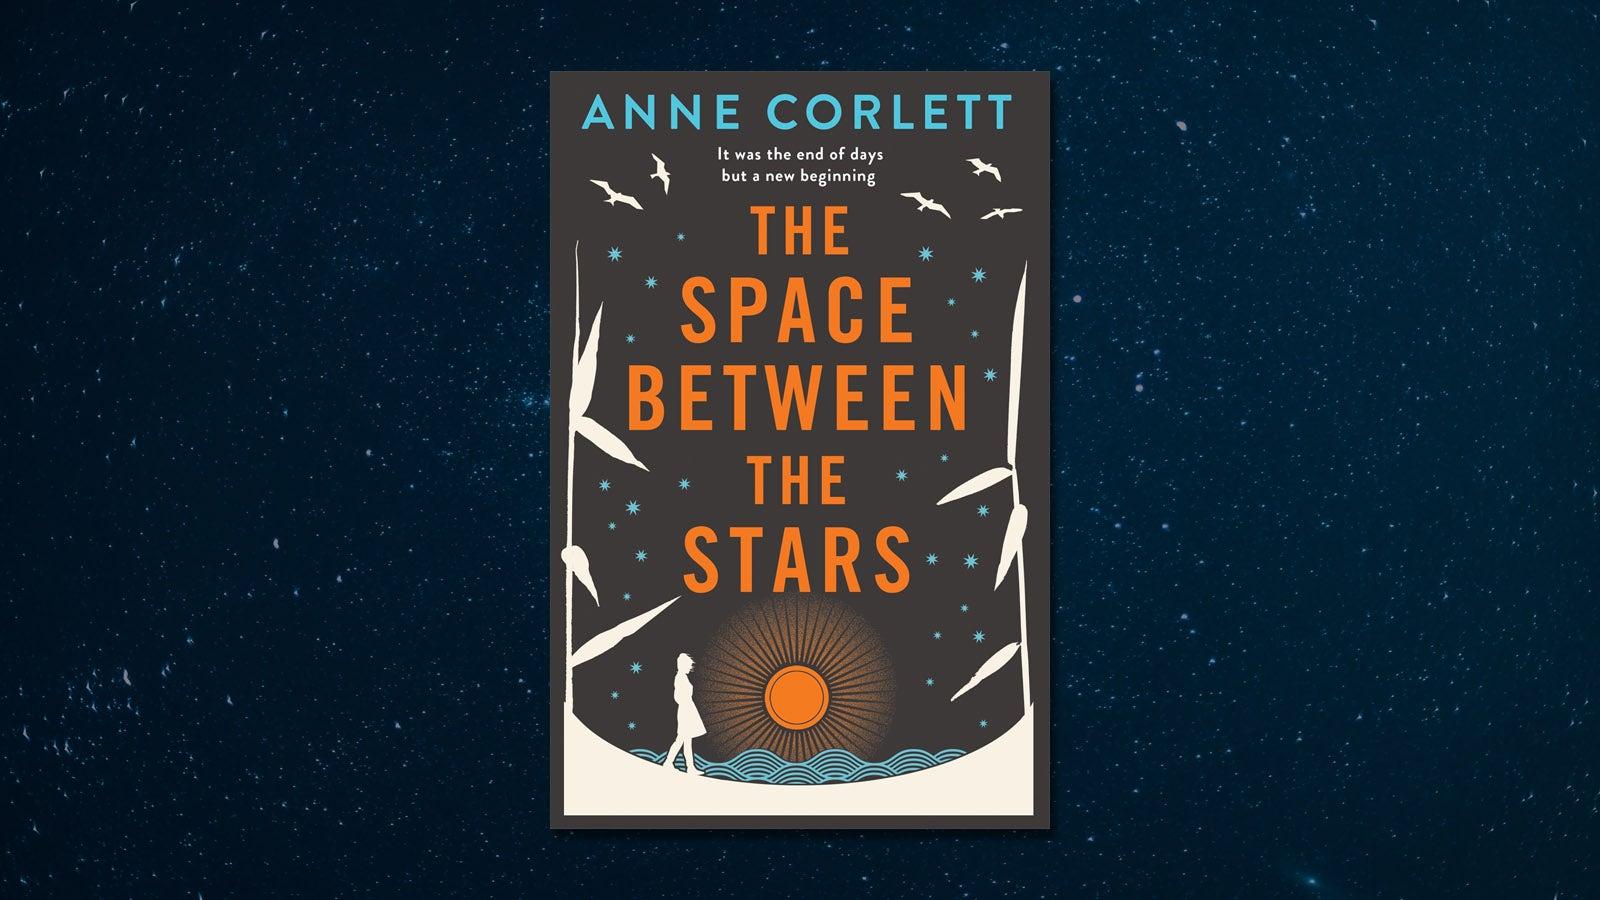 space-between-the-stars-anne-corlett.jpg